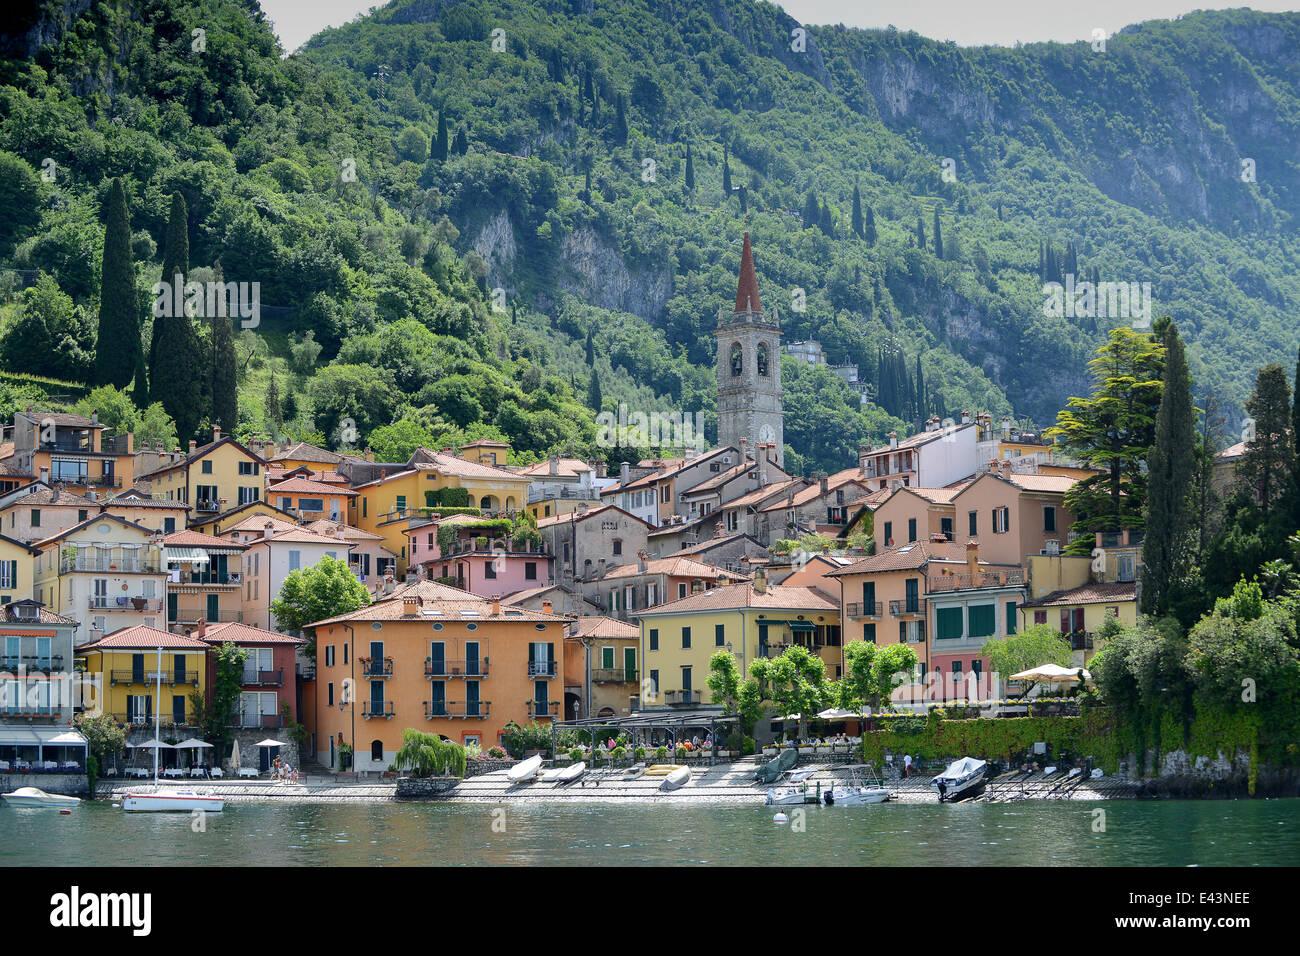 Varenna on Lake Como Italy - Stock Image